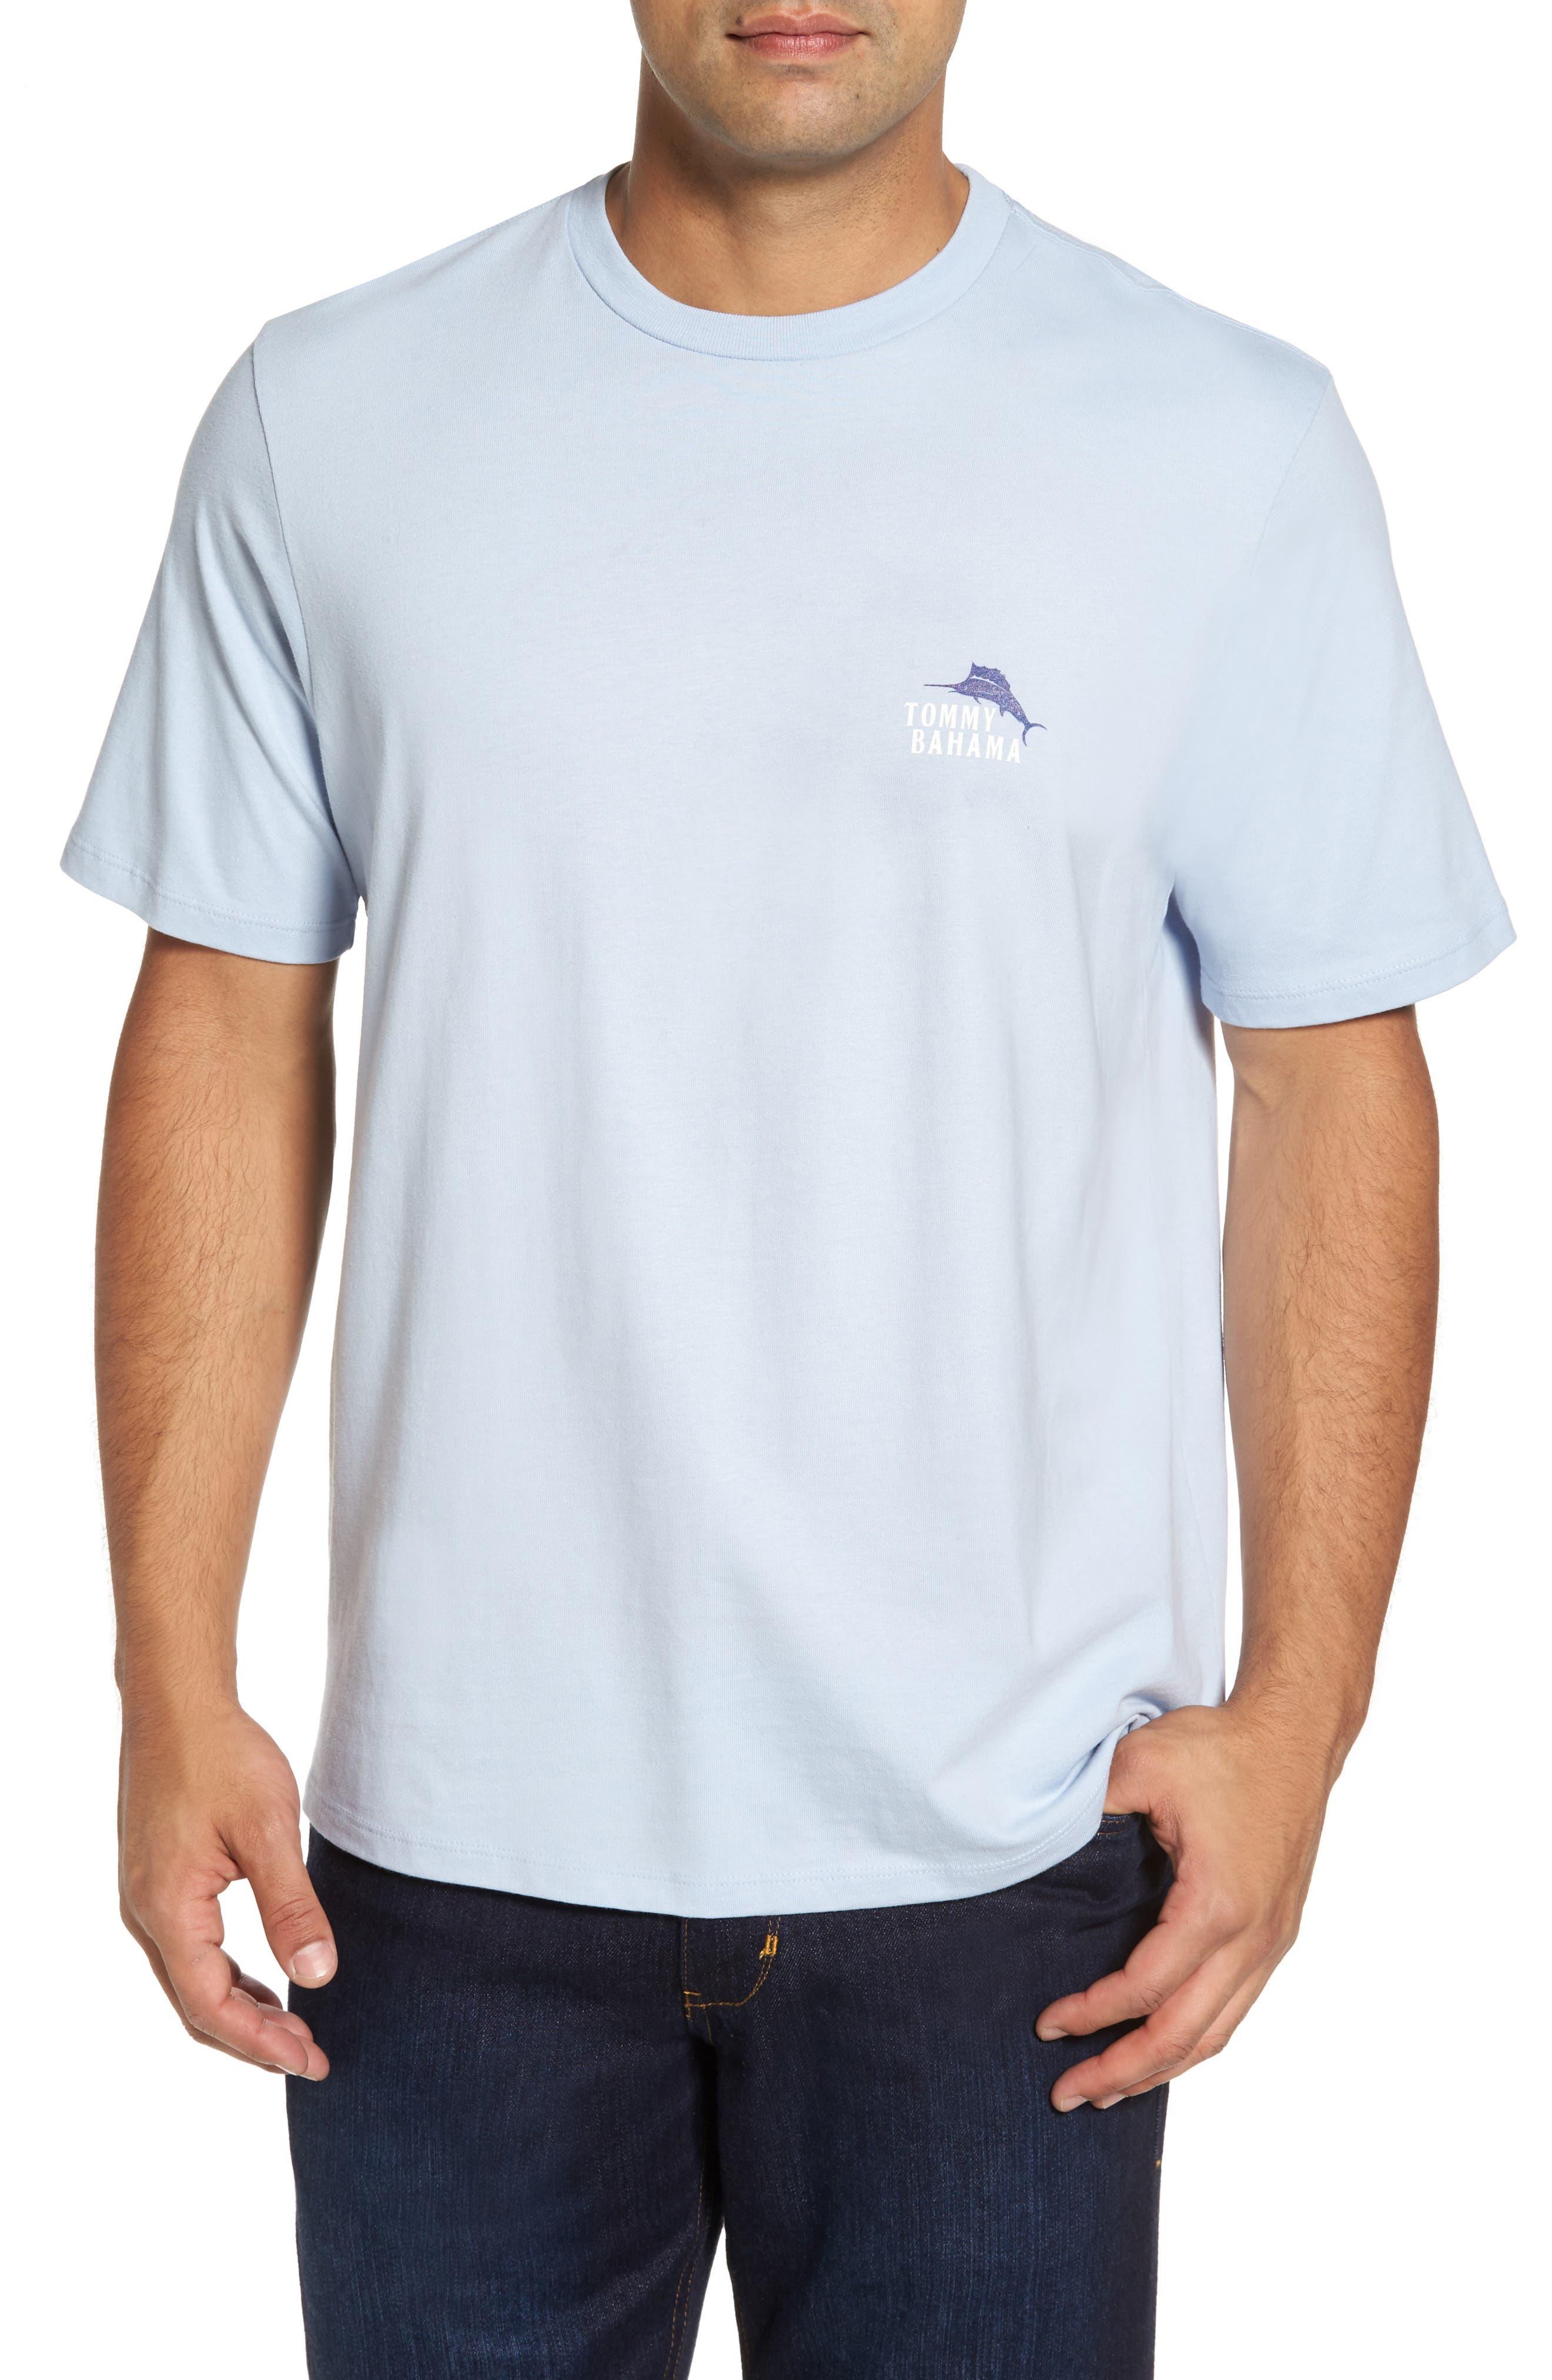 Casting Call Standard Fit T-Shirt,                             Main thumbnail 1, color,